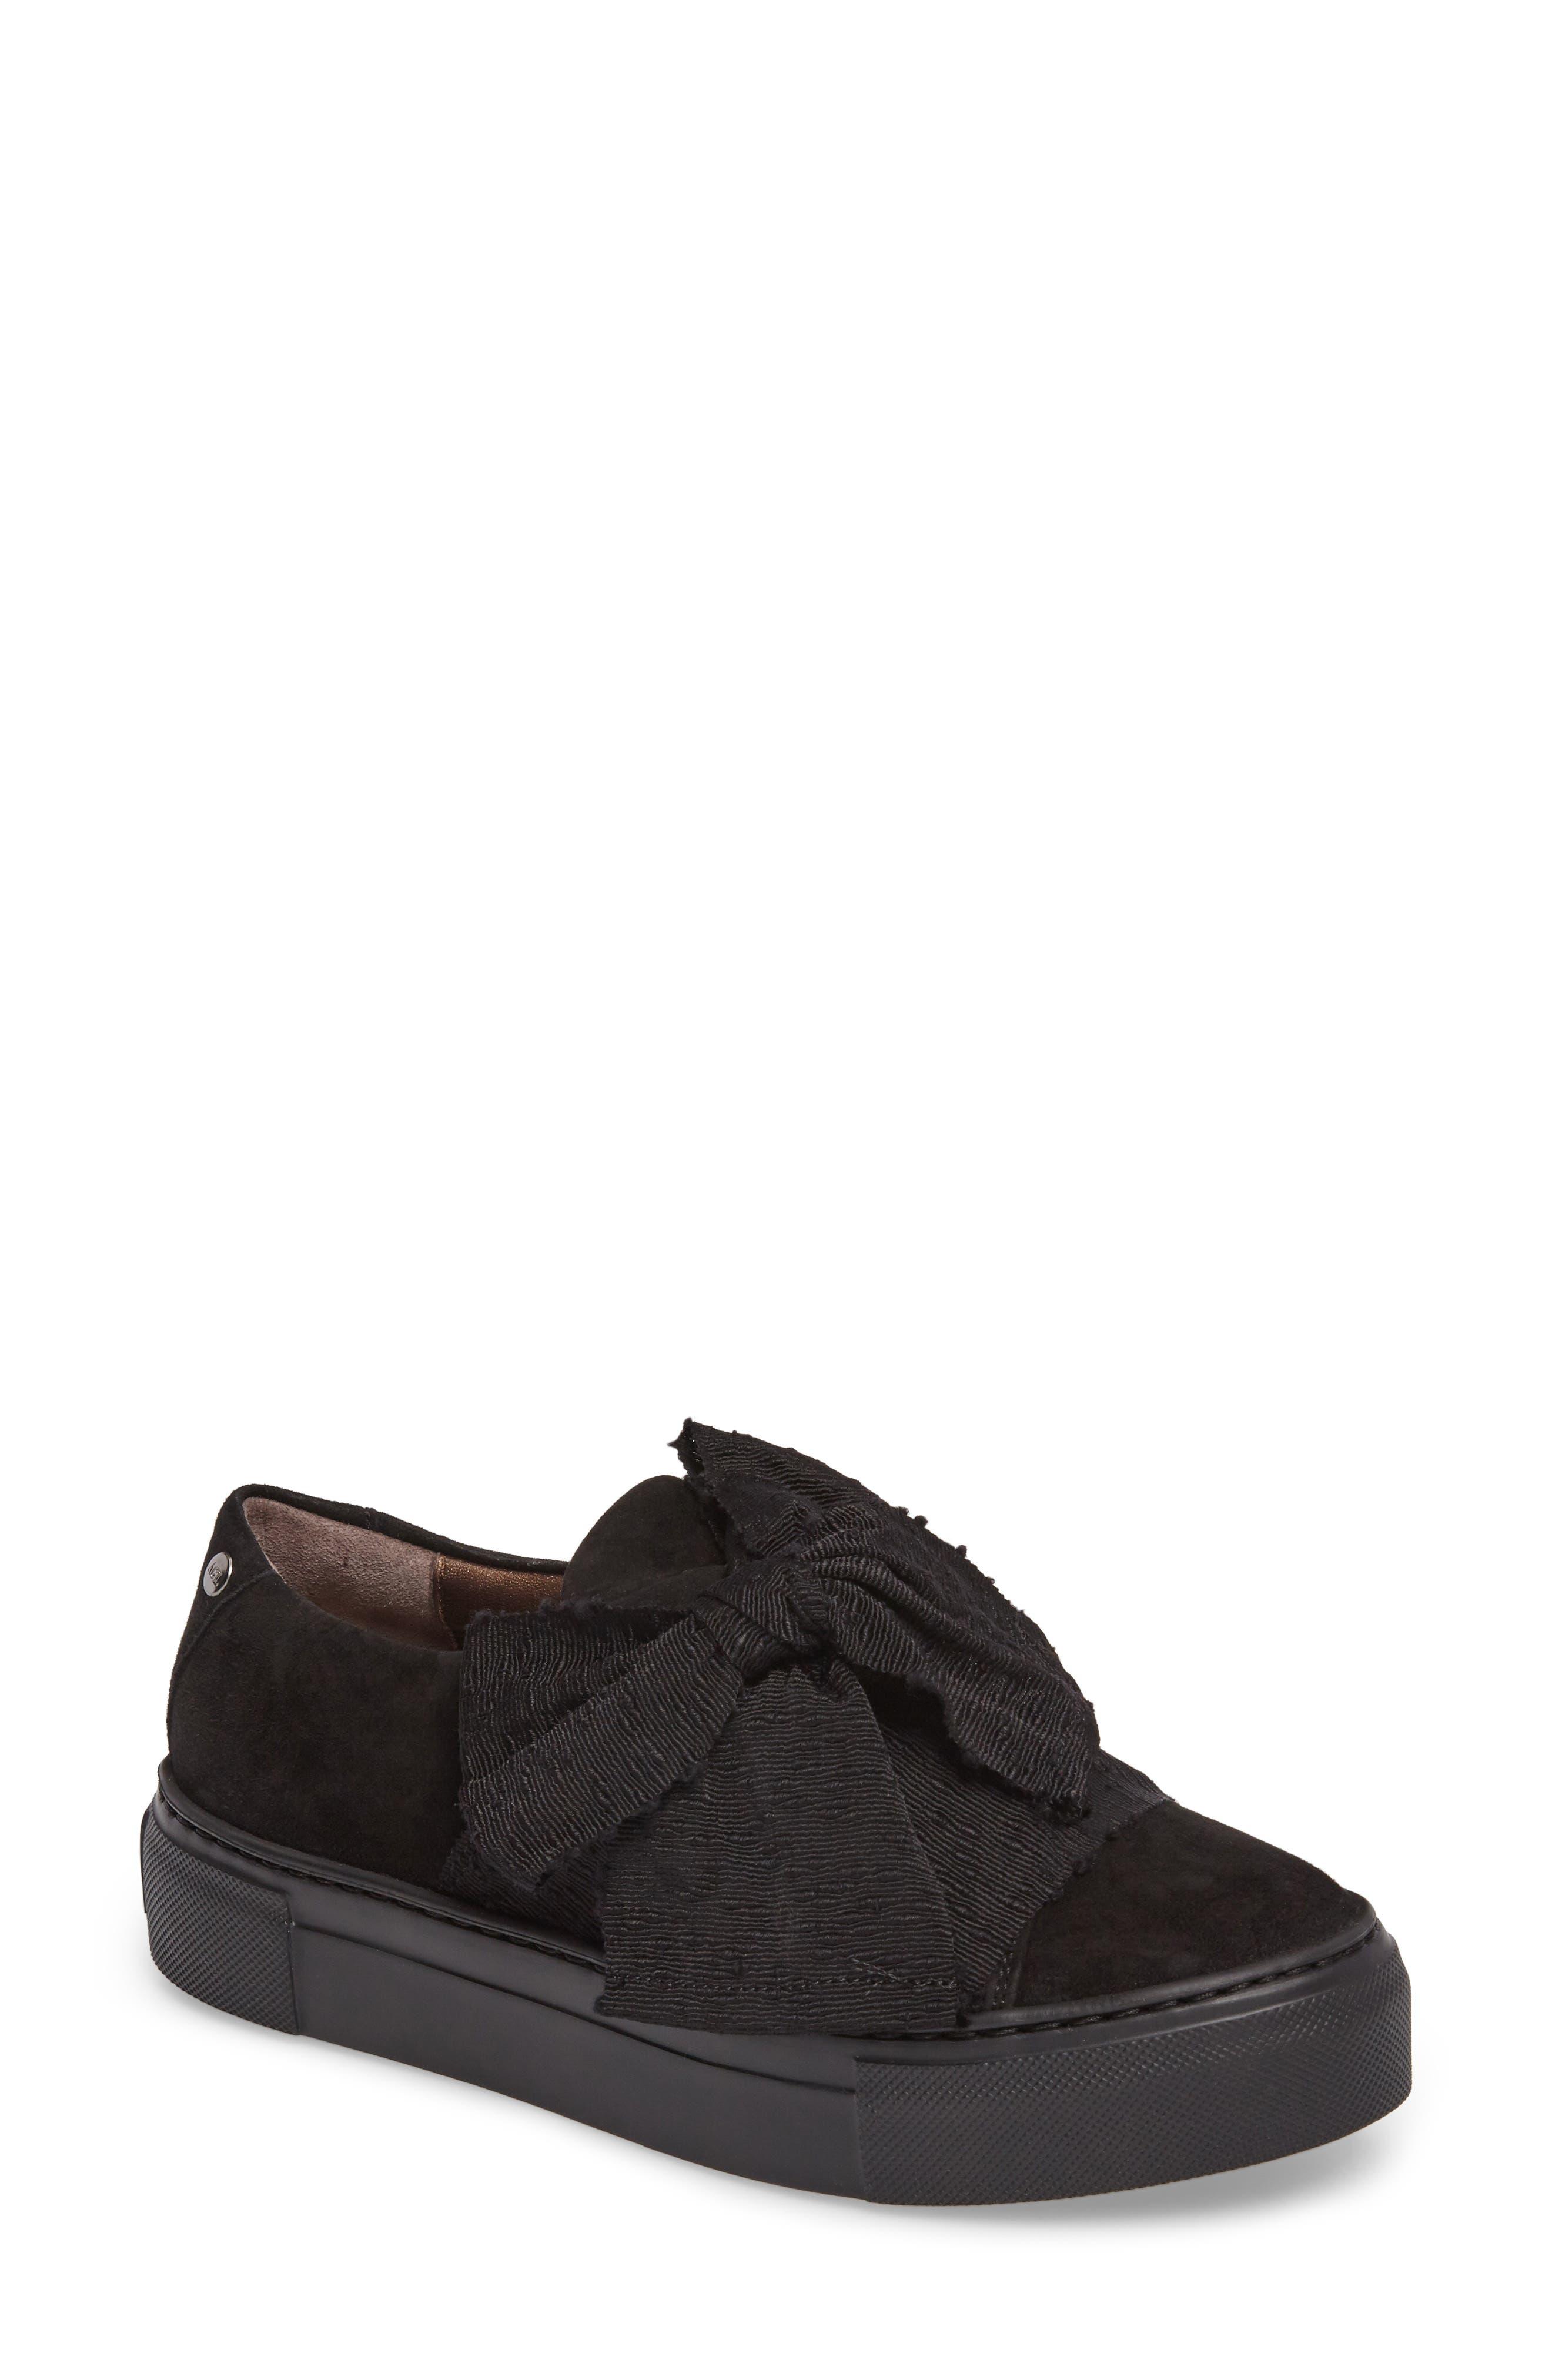 Bow Platform Sneaker,                             Main thumbnail 1, color,                             002